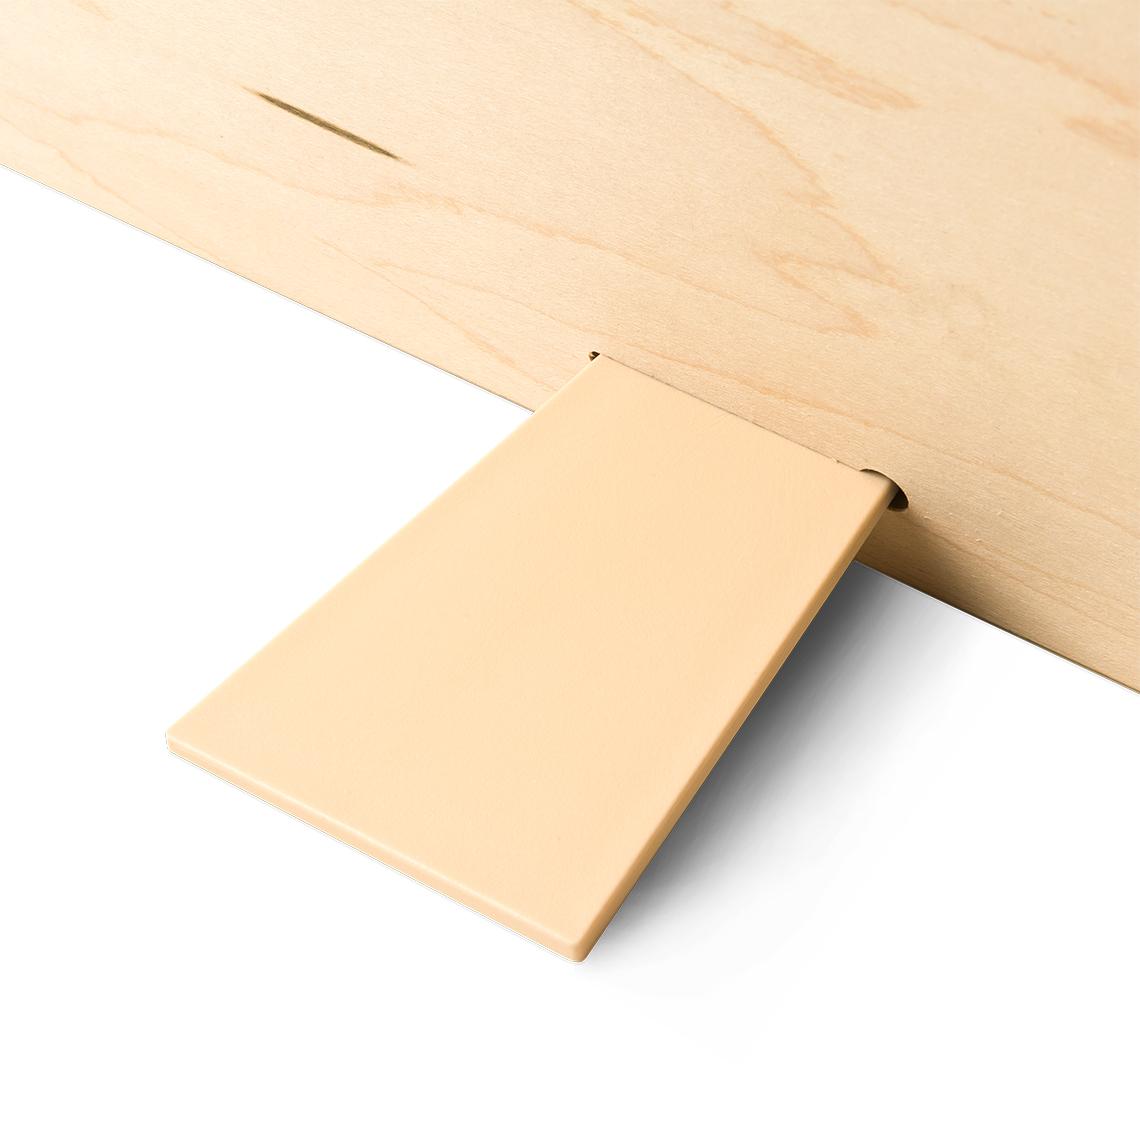 Maple Photo Panel, Tabletop, 8x10 | Maple Photo Panel, Tabletop ...